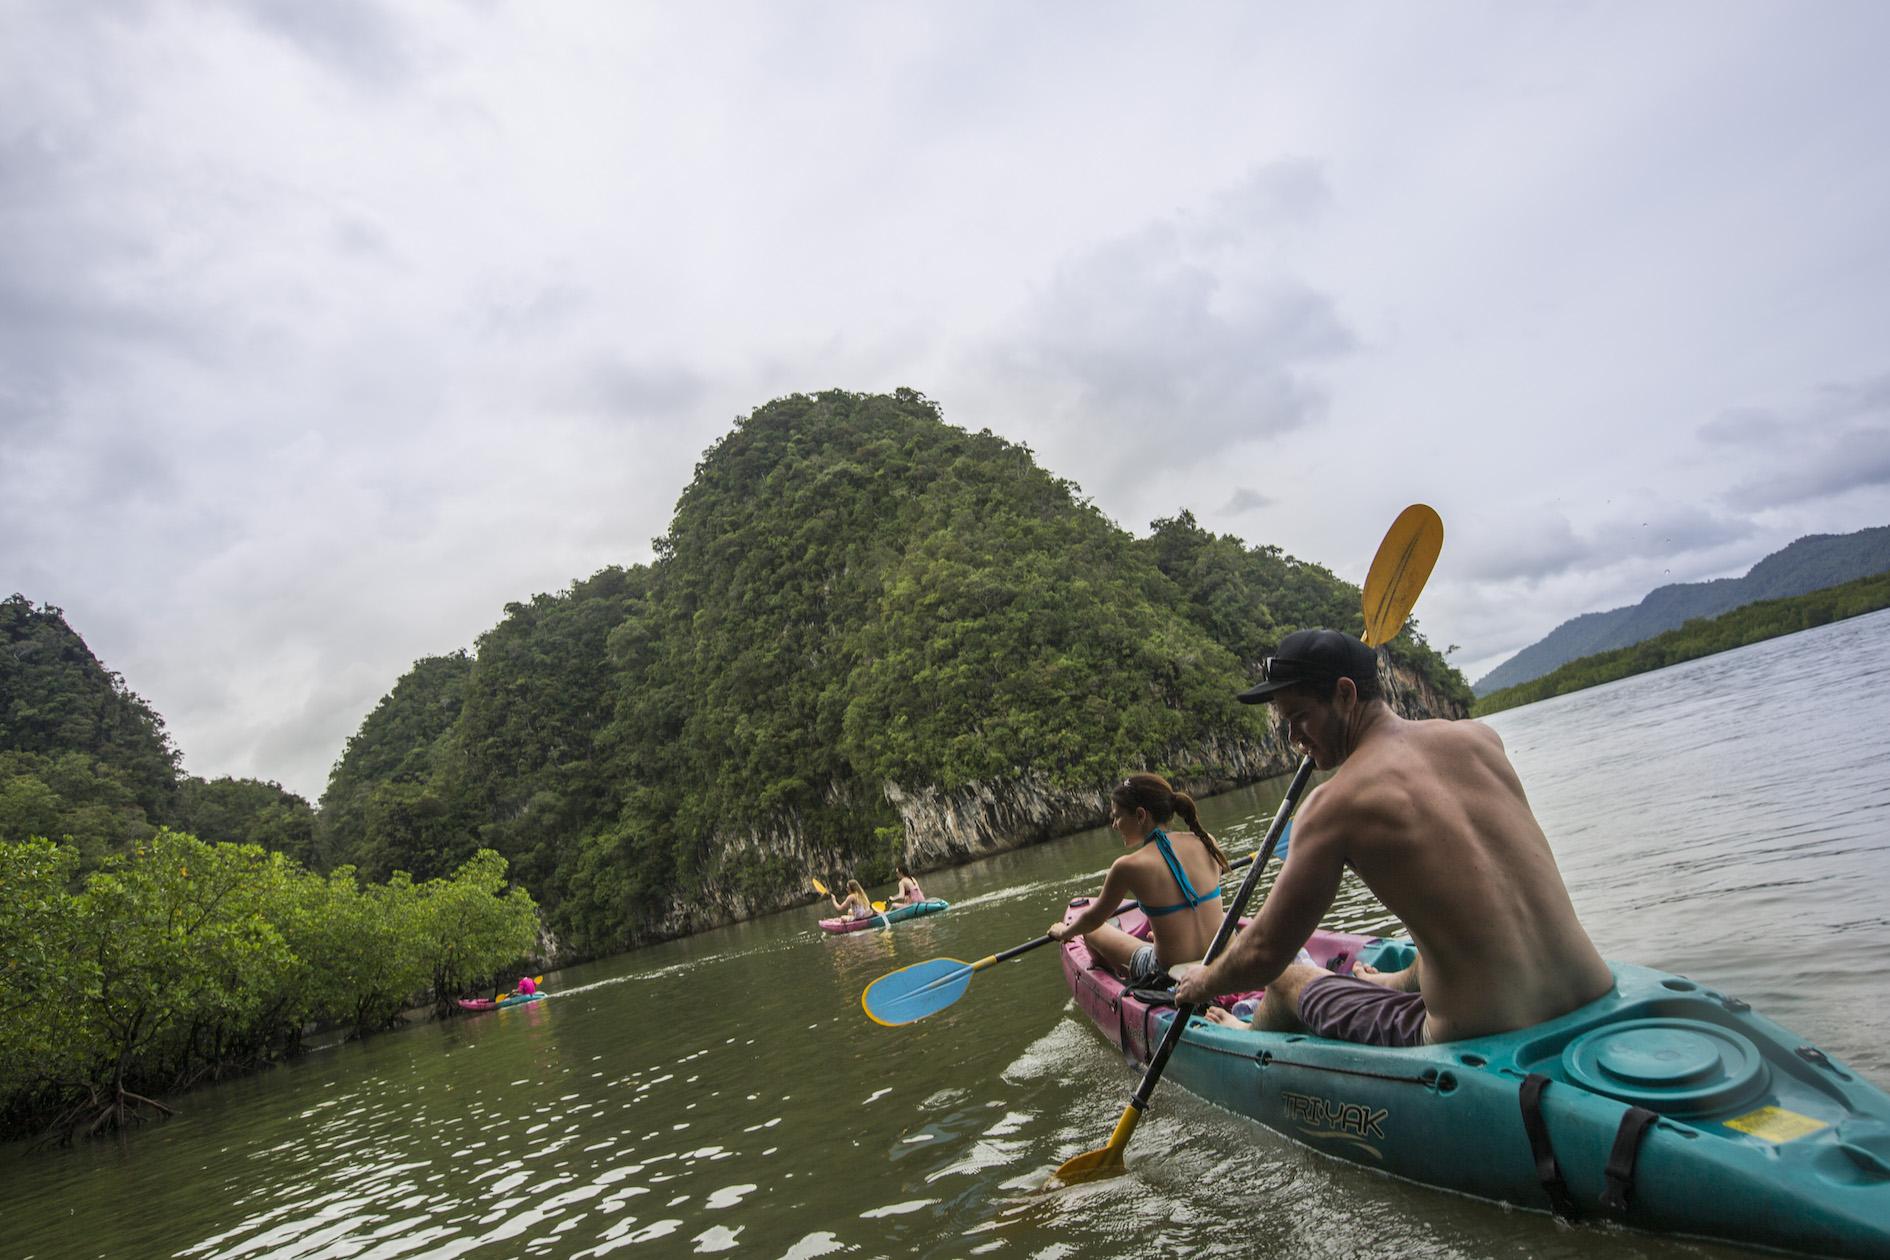 Thailand Krabi Kayaking Mangrove Ocean Travellers-Shereen Mroueh 2013-HN1A8202 Lg RGB